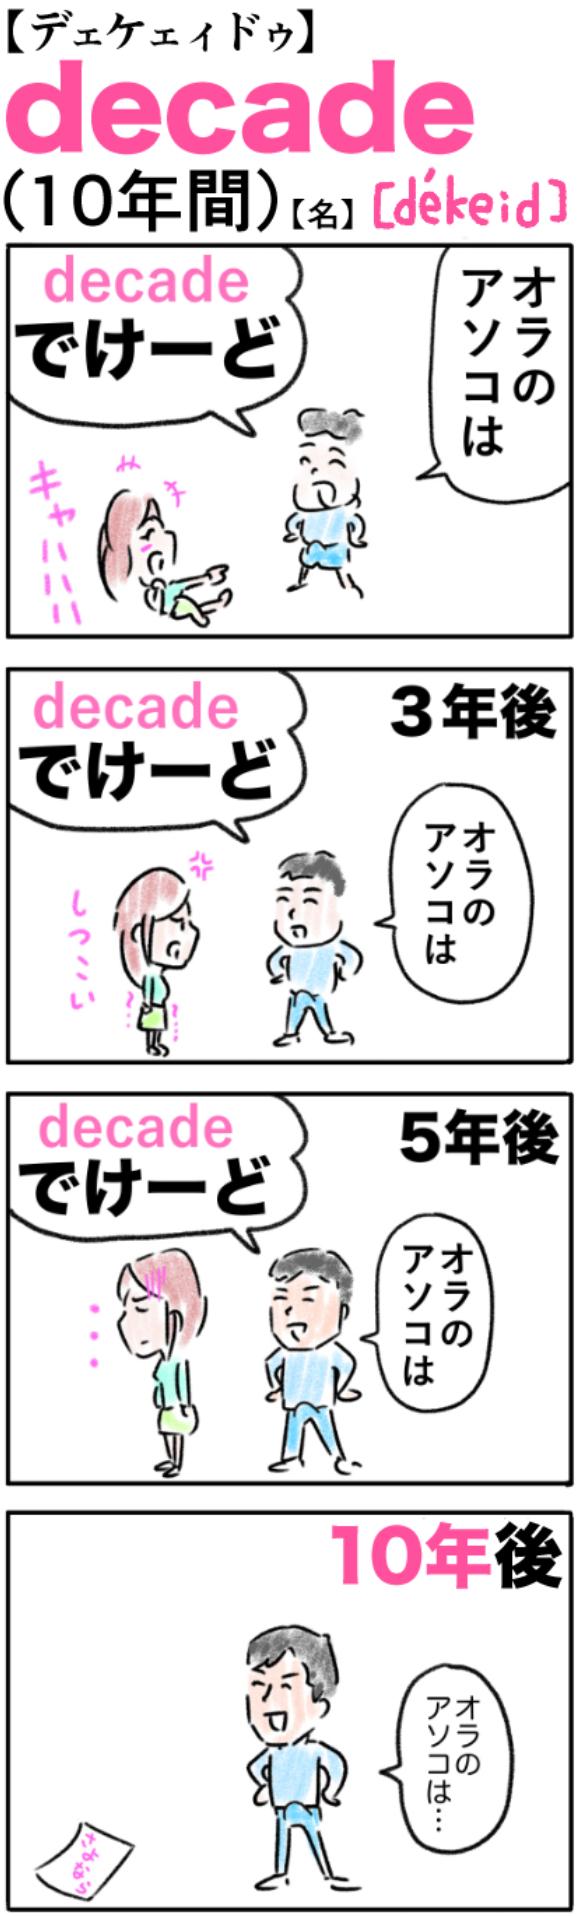 decade(10年間)の語呂合わせ英単語